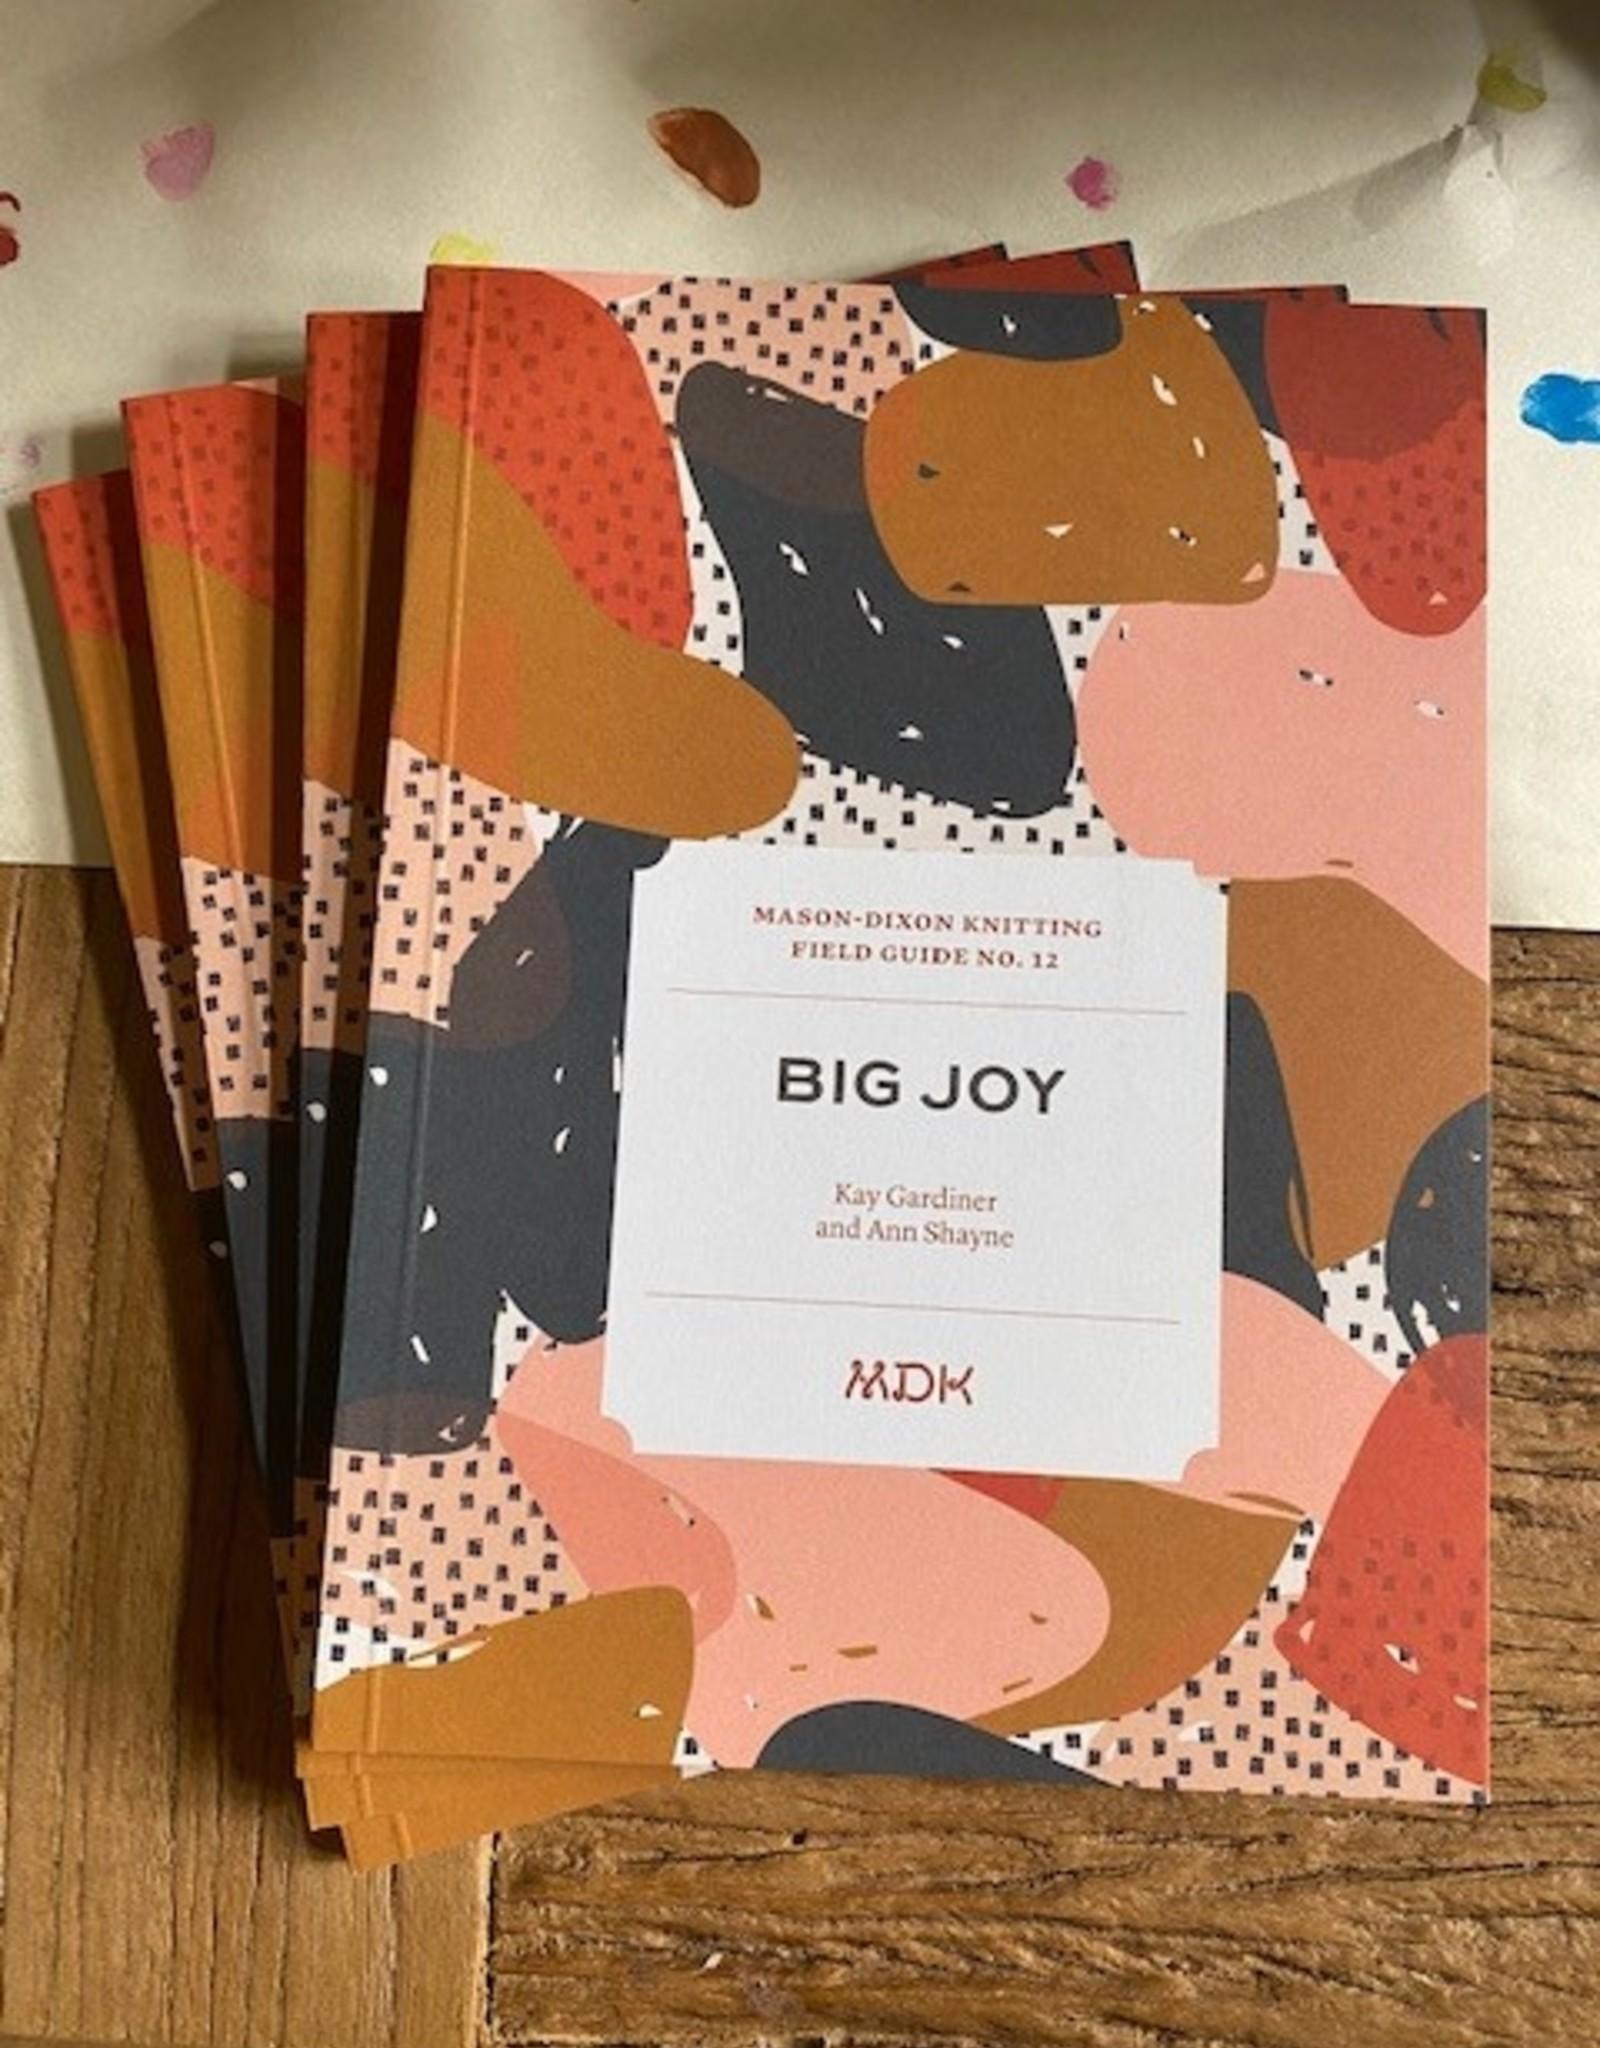 Modern Daily Knitting Field Guide No. 12 Big Joy